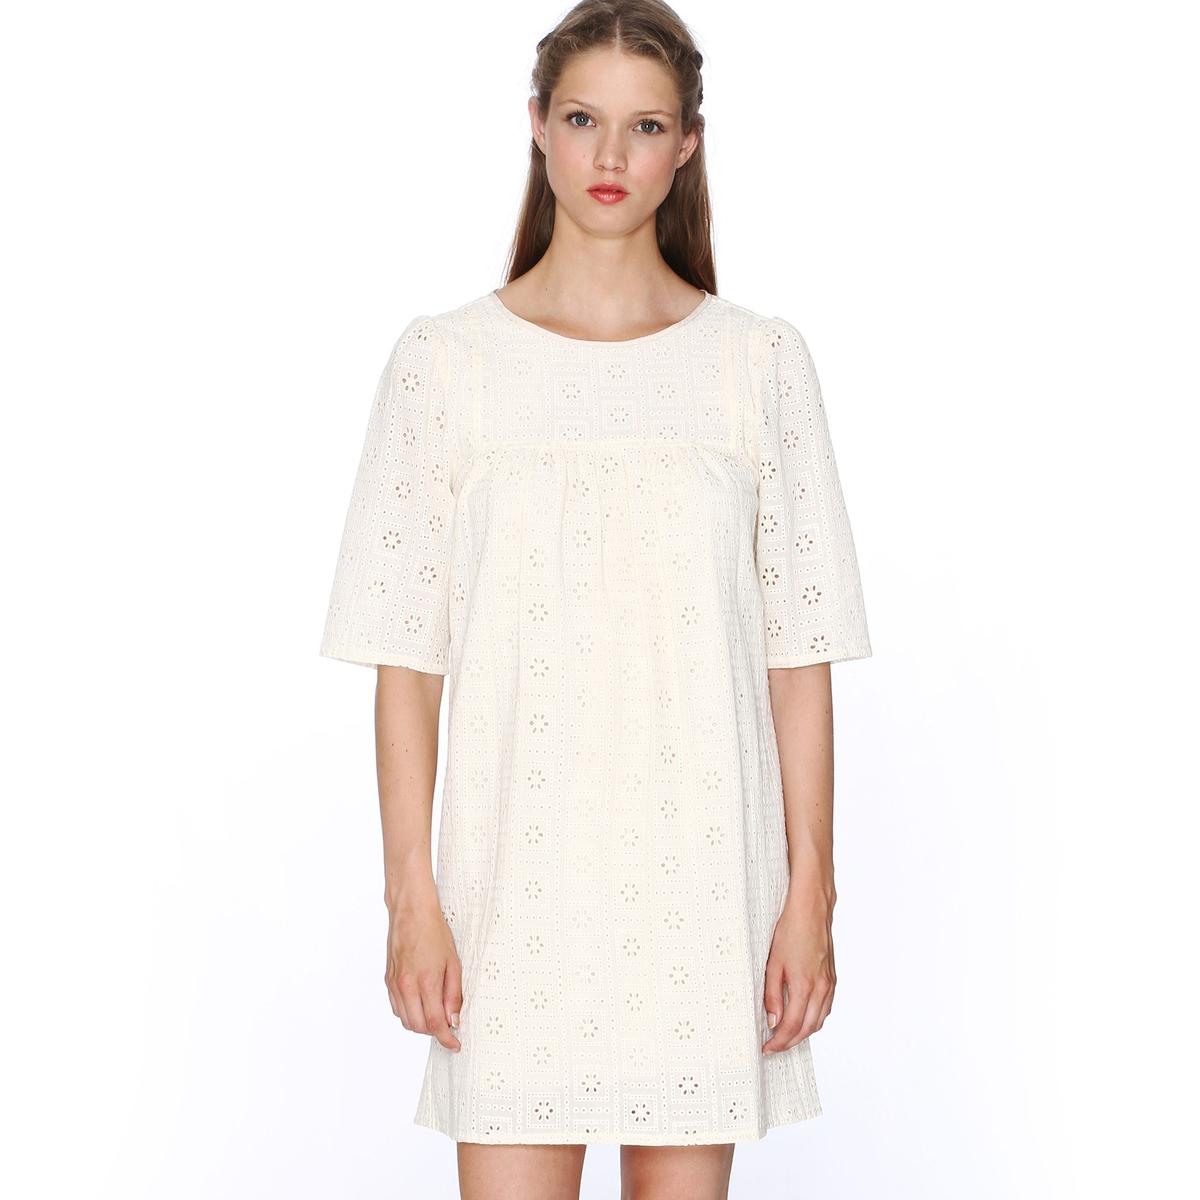 Платье с короткими рукавами из английского кружева PEPALOVES, Dress Claudia hp17 17 y061ur [1bx27ea] 17 3 1600x900 amd e2 7110 4gb ssd128gb m 2 dvd rw w10 red